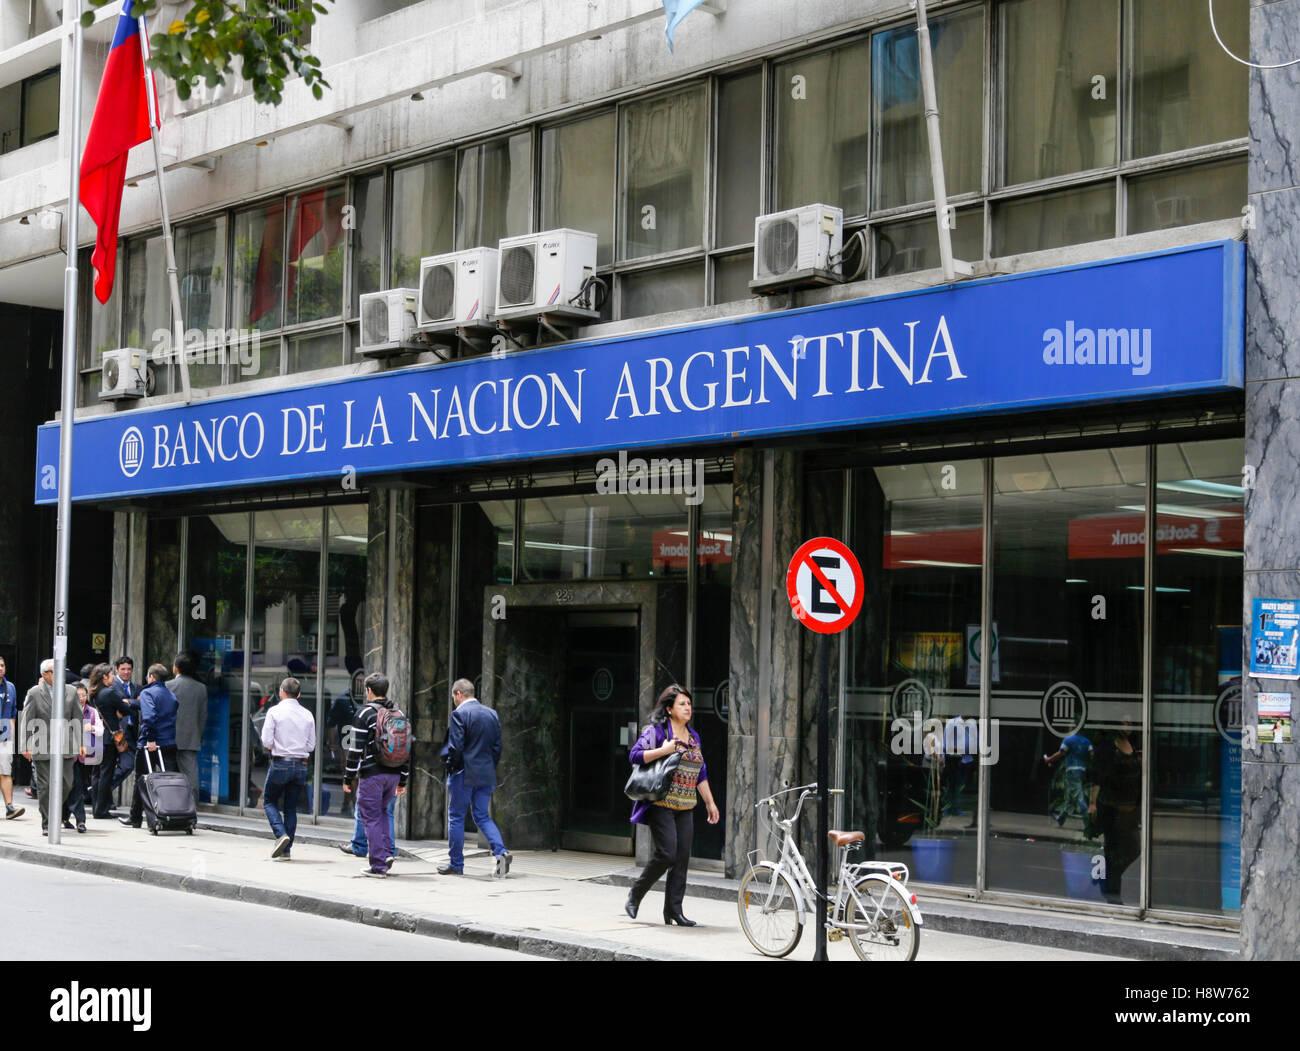 Banco De La Nacion Argentina Stock Photo: 125944282 - Alamy